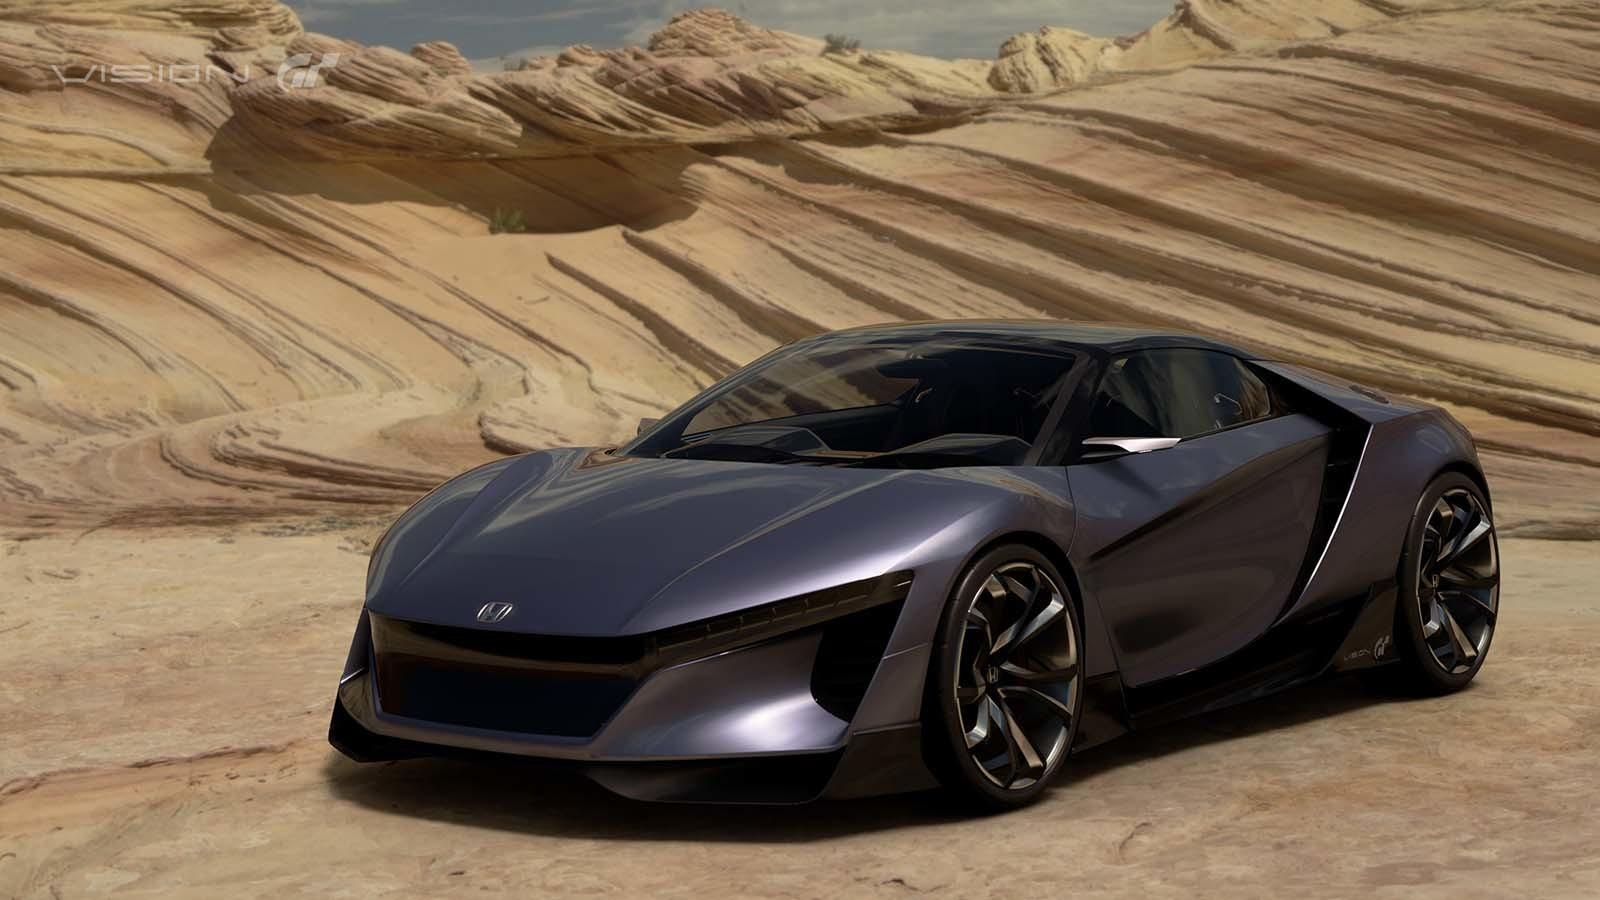 Honda Vision Gran Turismo Concept